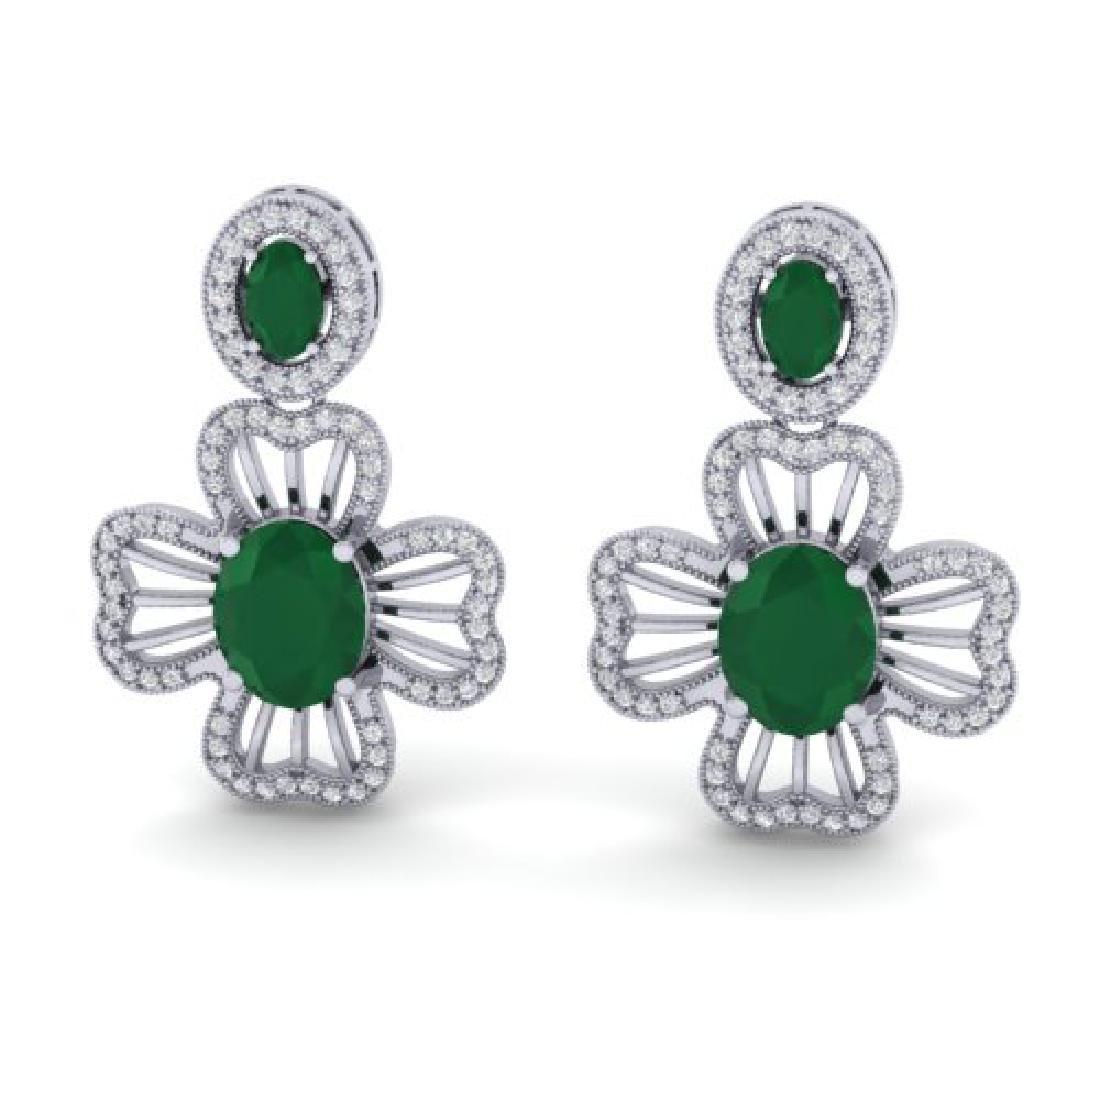 9.26 CTW Emerald & Micro Pave VS/SI Diamond Earrings